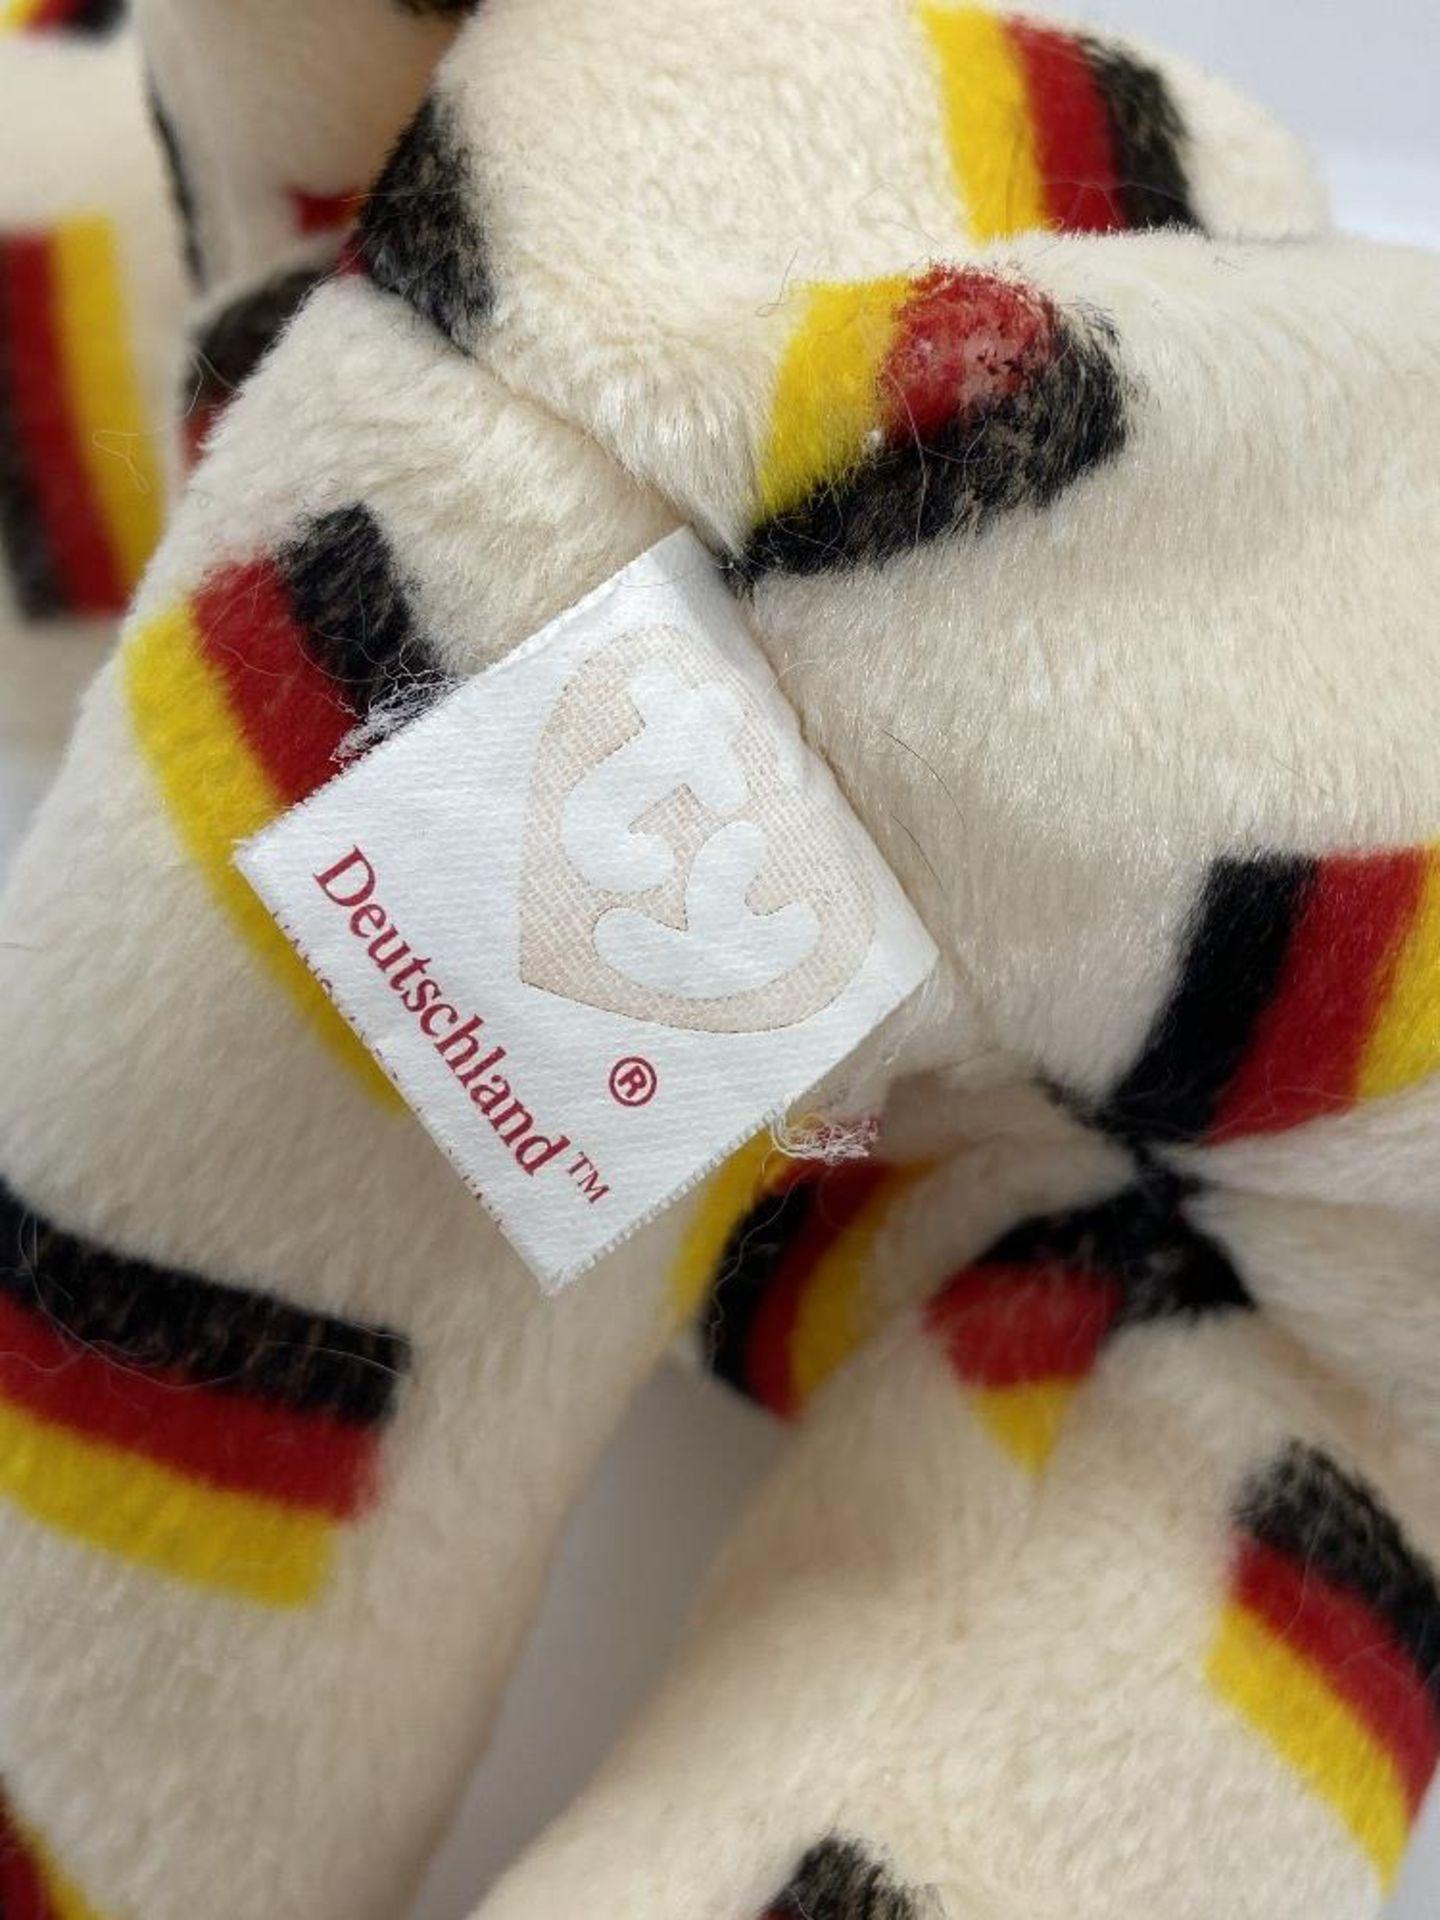 Ty Beanie Babies Deutschland, Germany Flag Bear, 2003 PE Pellets, w/o Hang Tags - Image 5 of 6